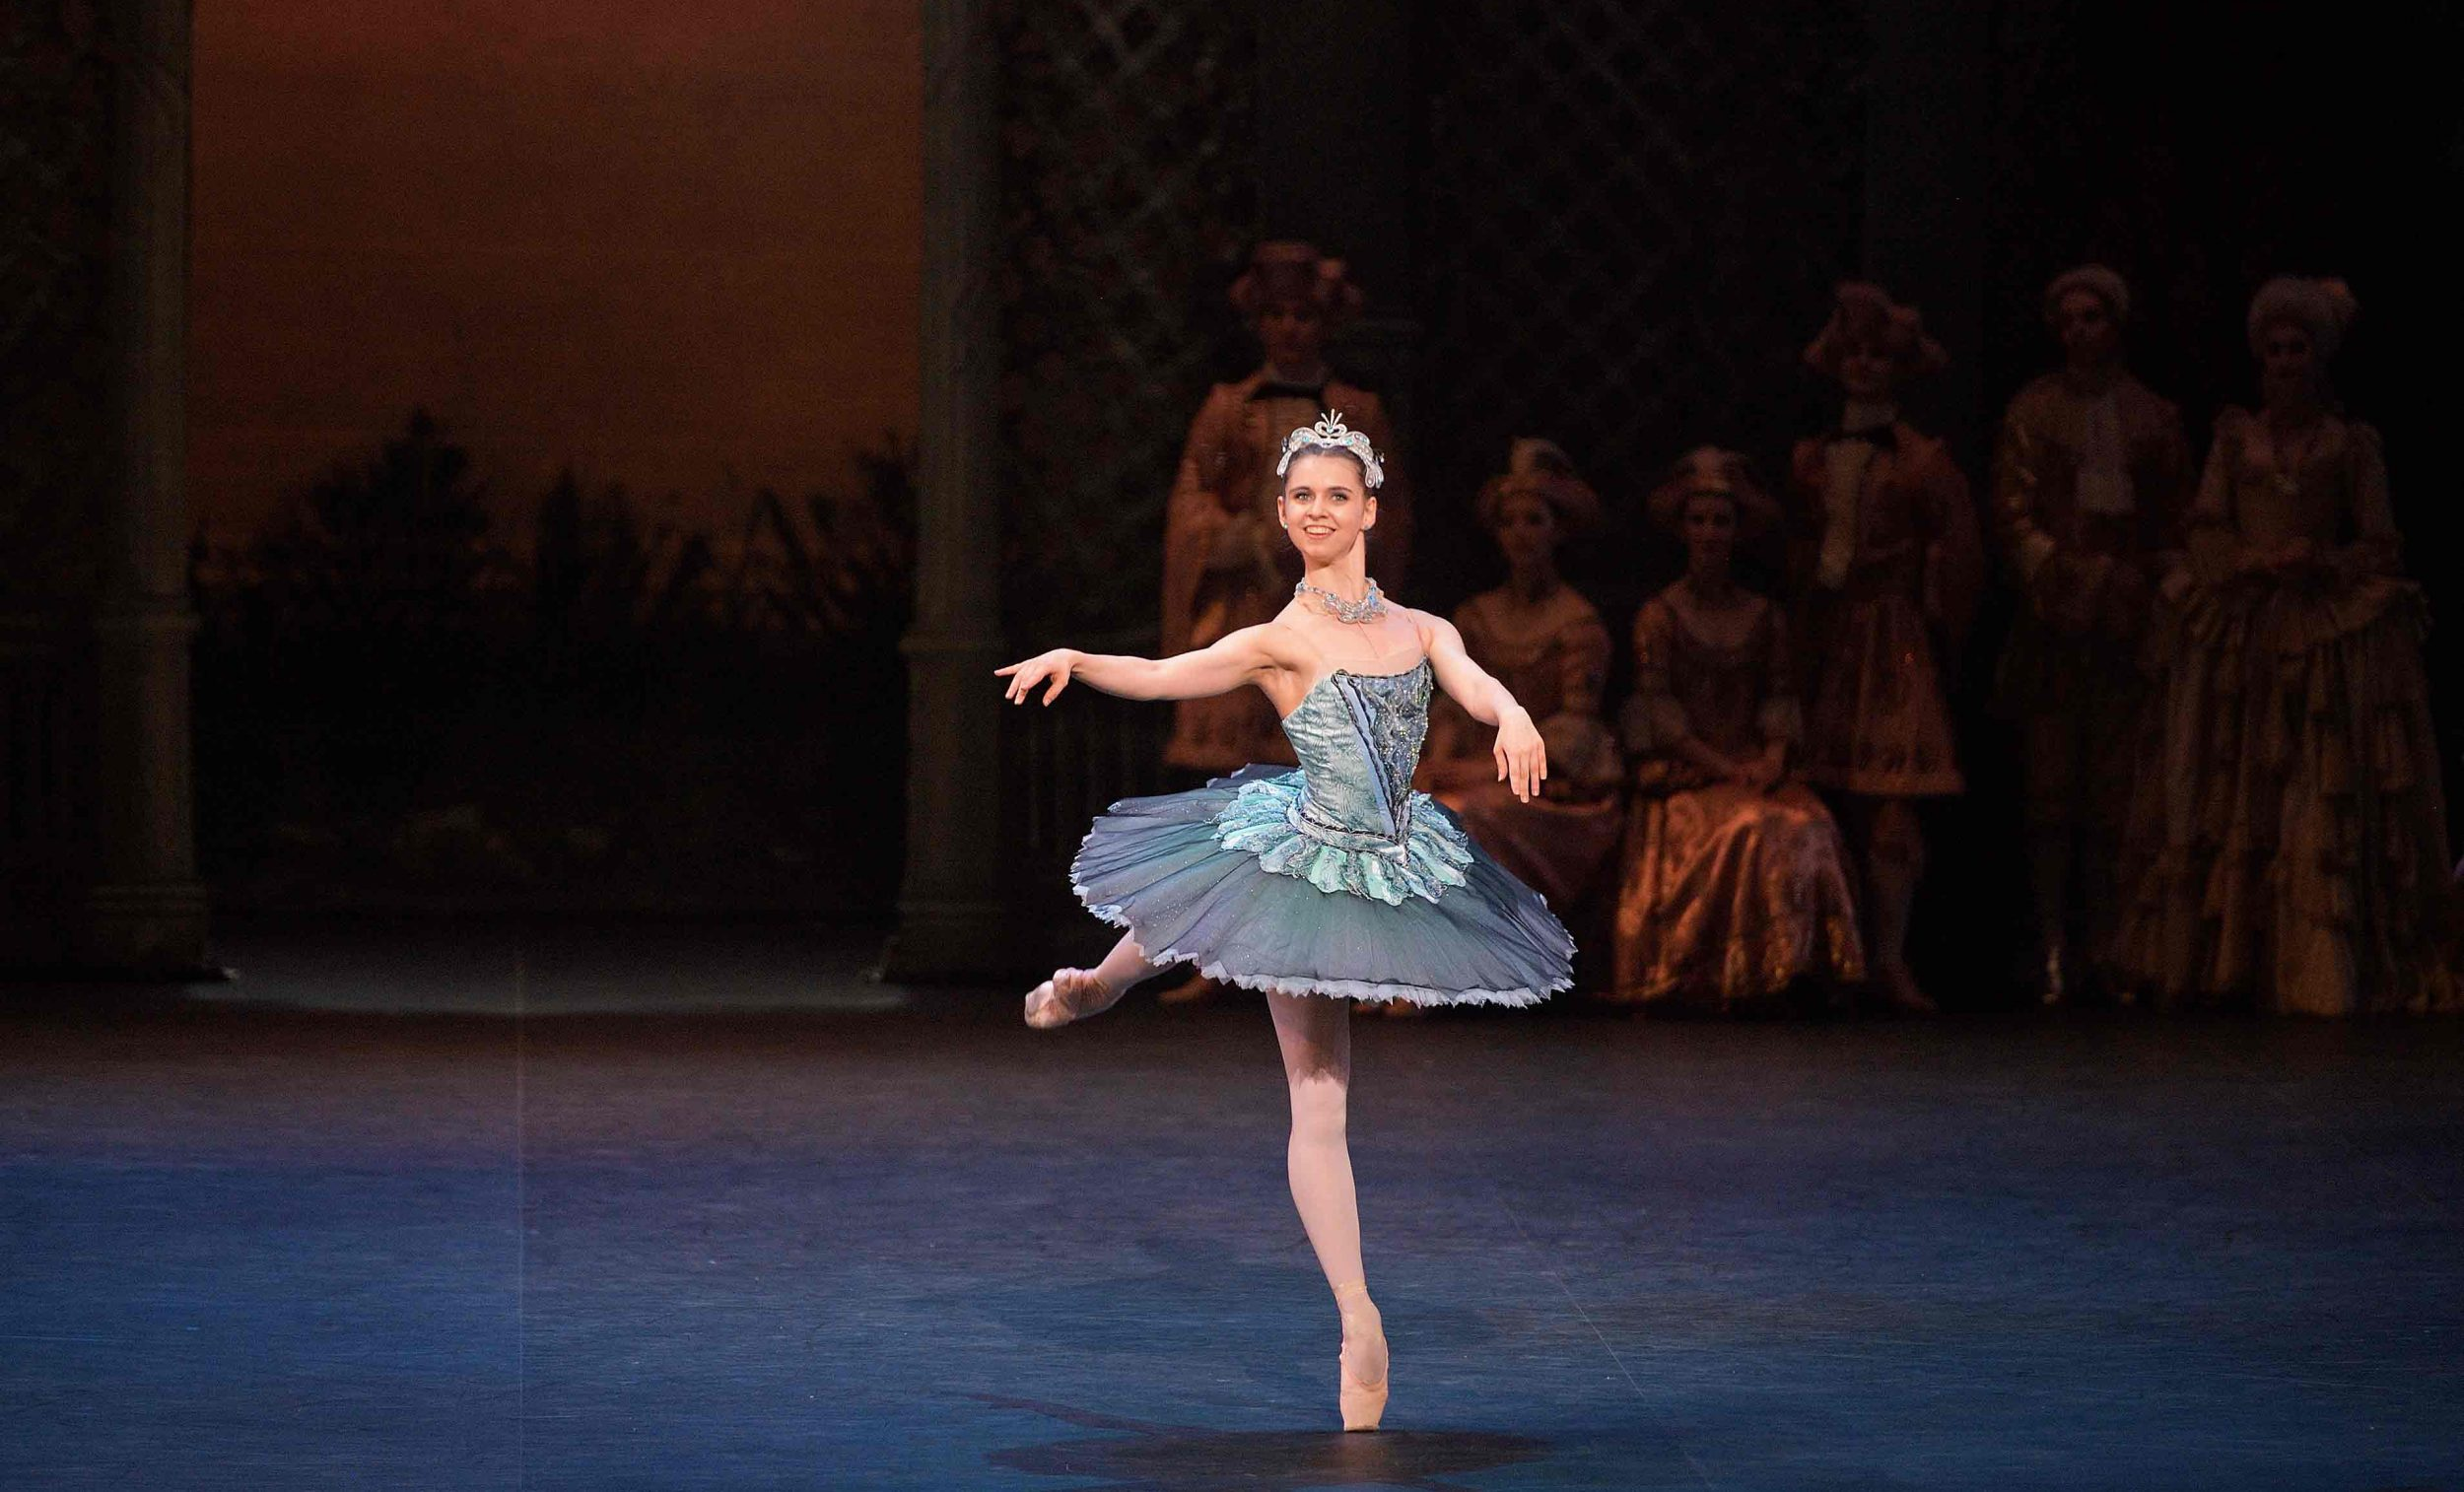 Julia-Conway-as-Princess-Florine-in-The-Sleeping-Beauty-©-Laurent-Liotardo-(2)_WEB